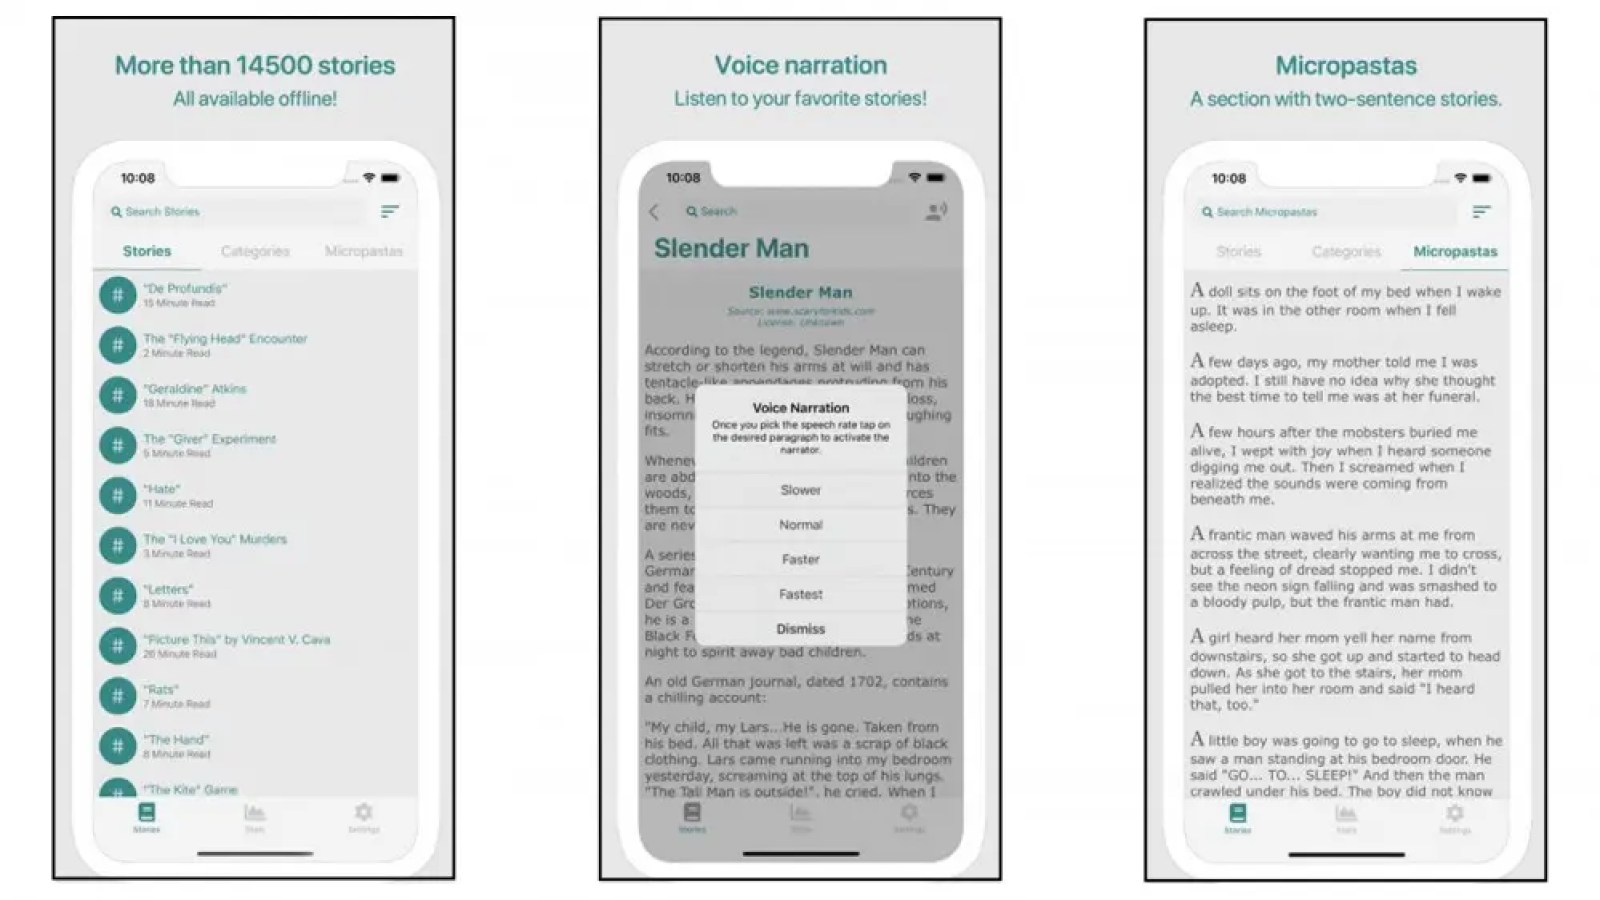 Creepypasta app with urban legend fiction scary stories